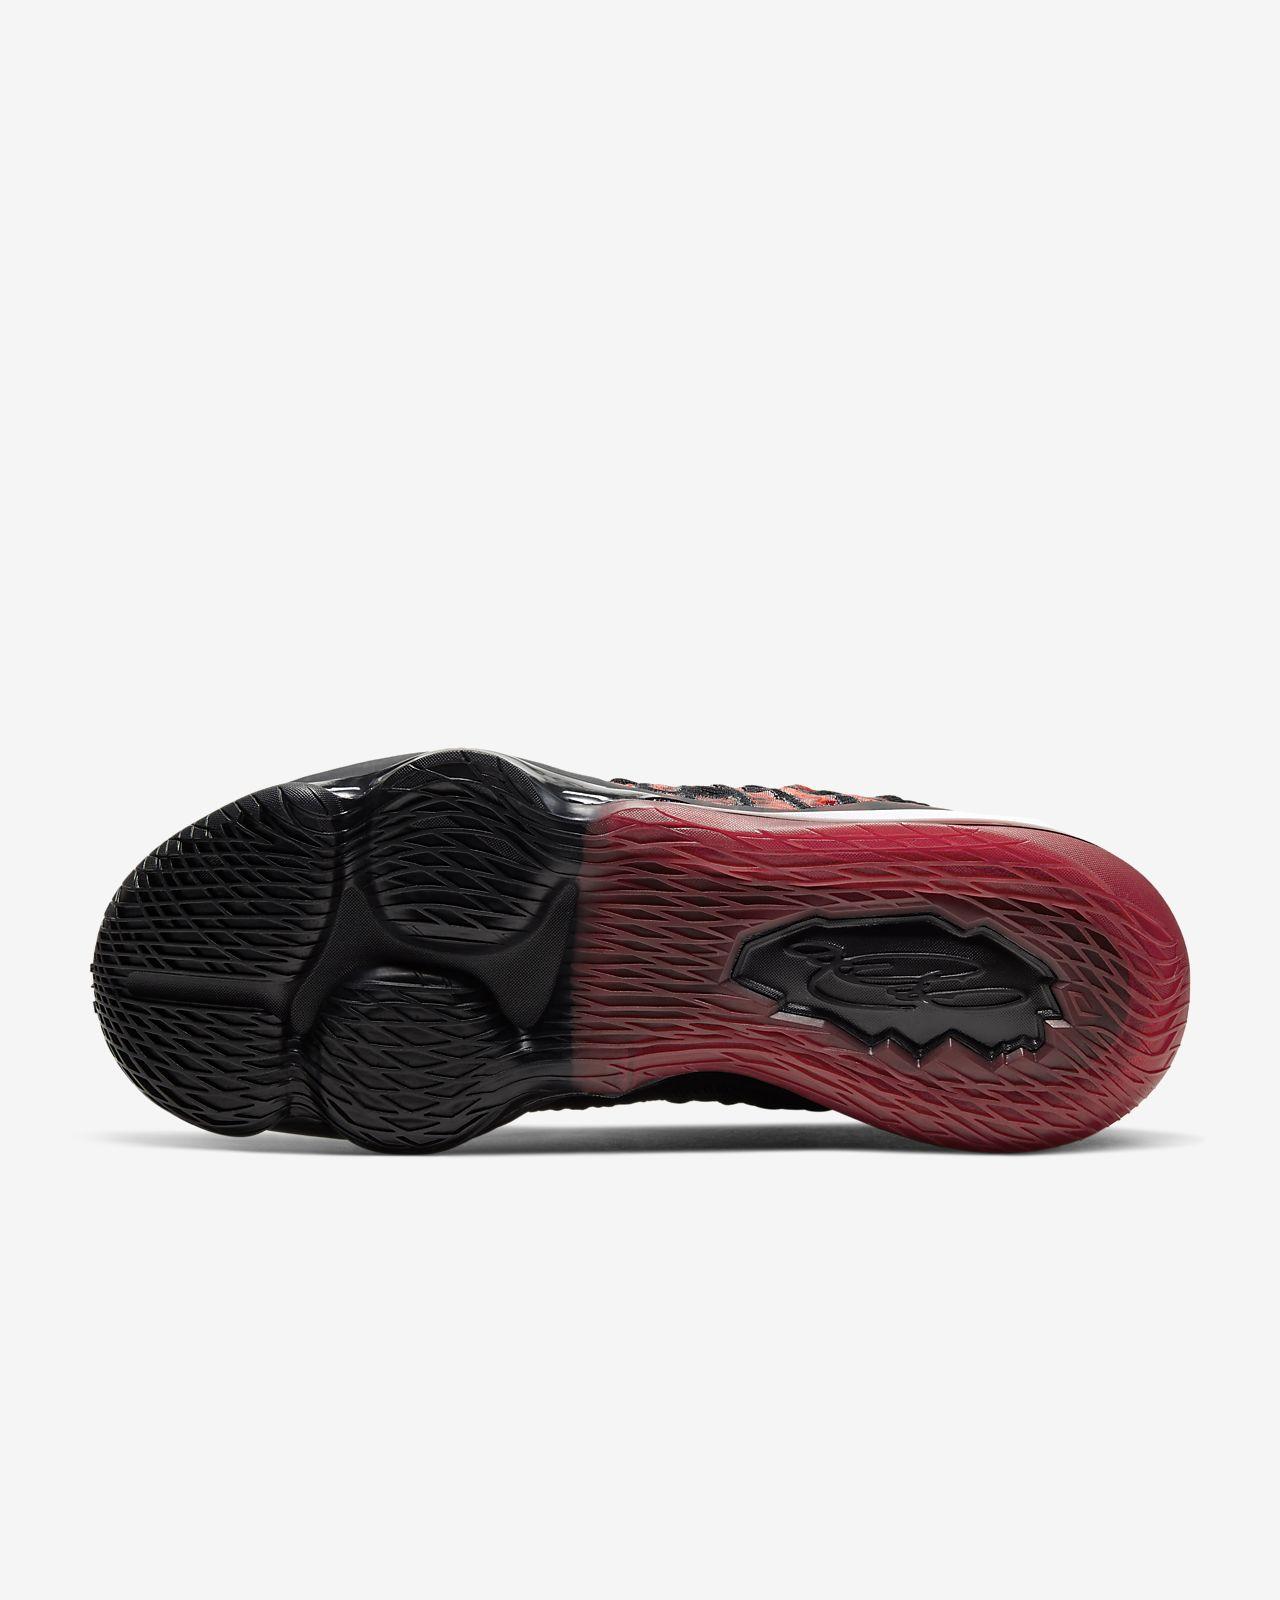 Dettagli su NIKE AIR JORDAN 1 Hi Flyease retro US 9 EU 42,5 scarpe basket Sneakers pelle